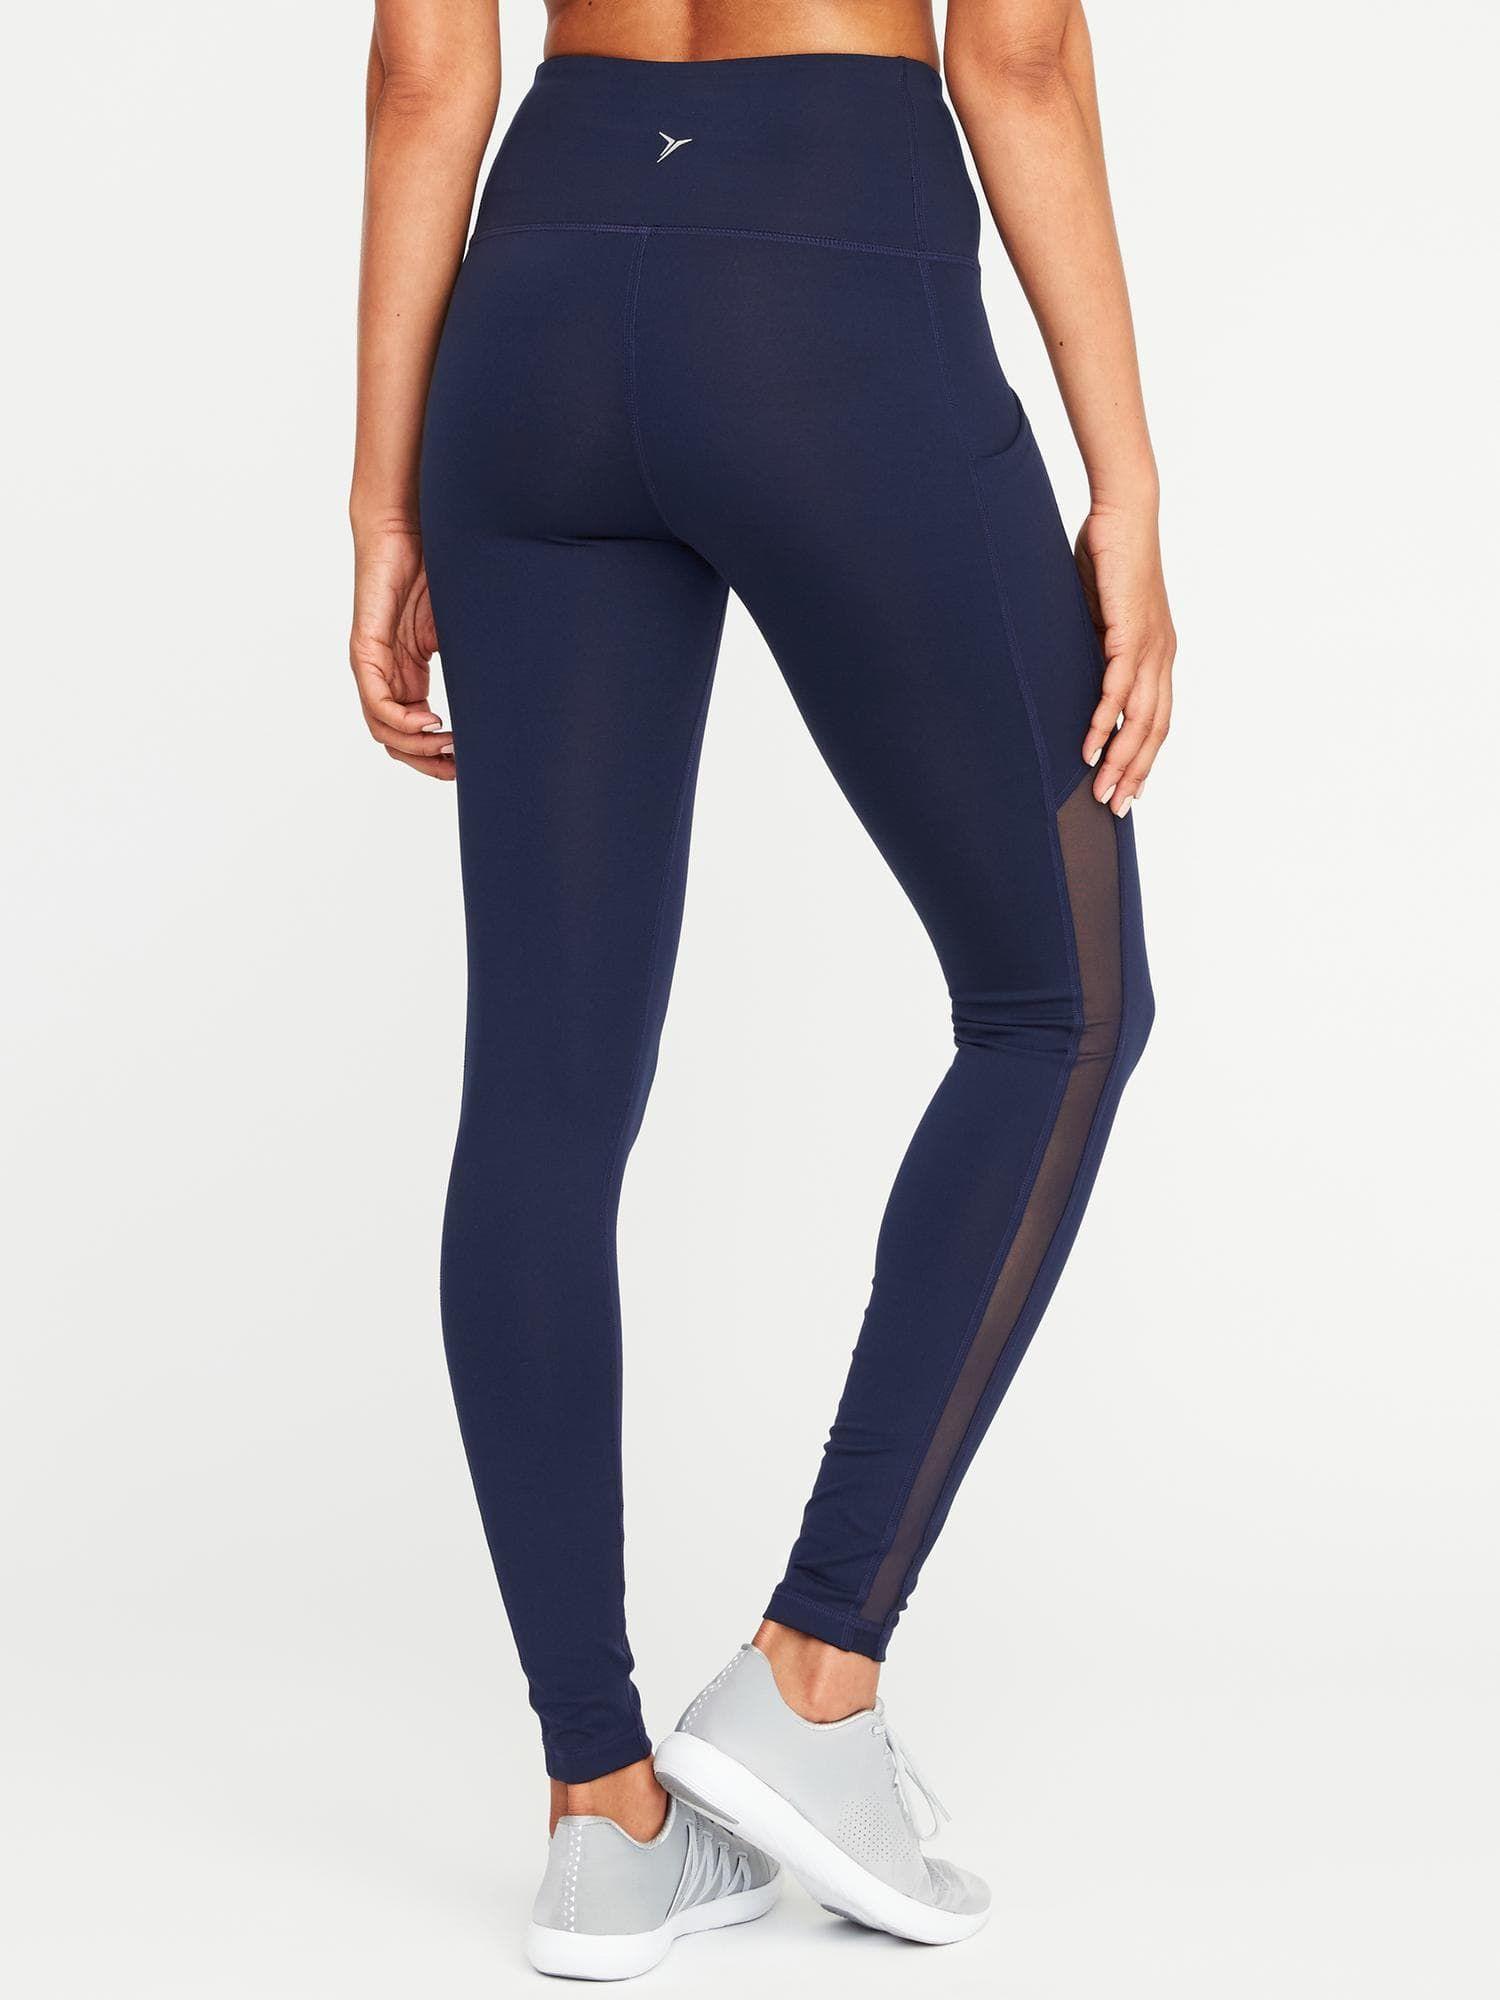 2b5b6e8b3e54 High-Rise Side-Pocket Mesh-Trim Compression Leggings for Women